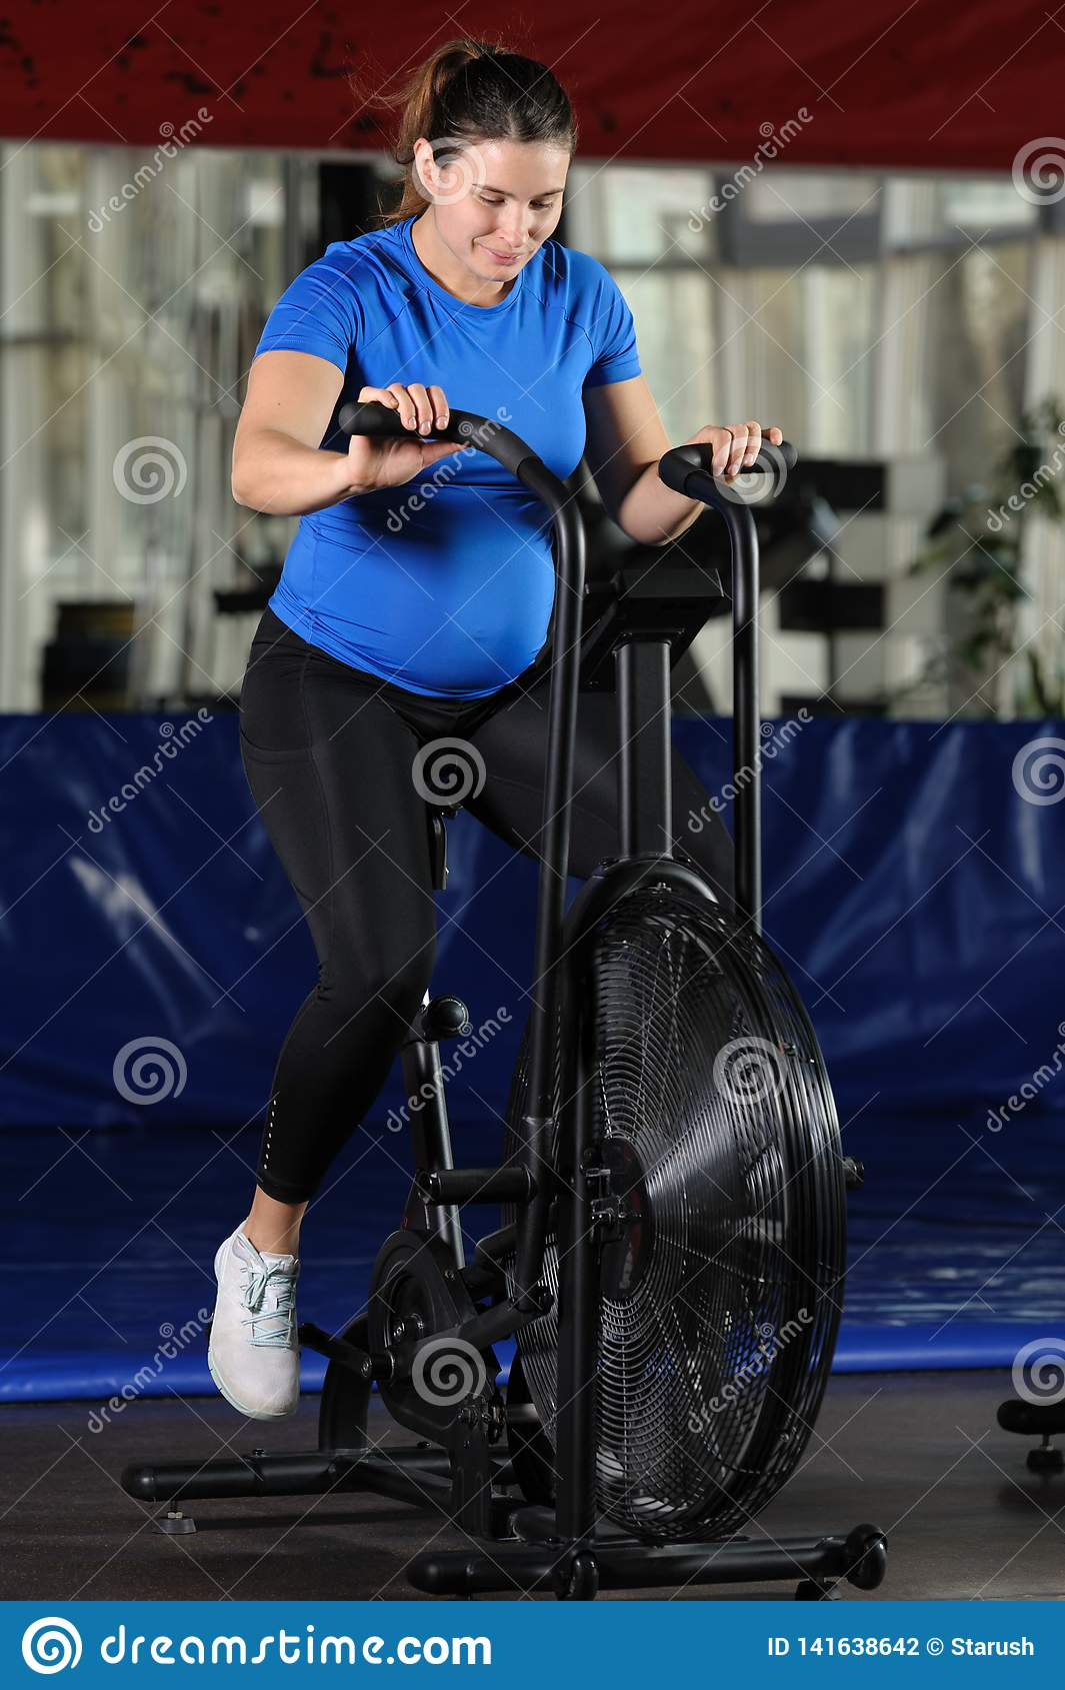 Pregnant woman doing intense workout at gym air bike